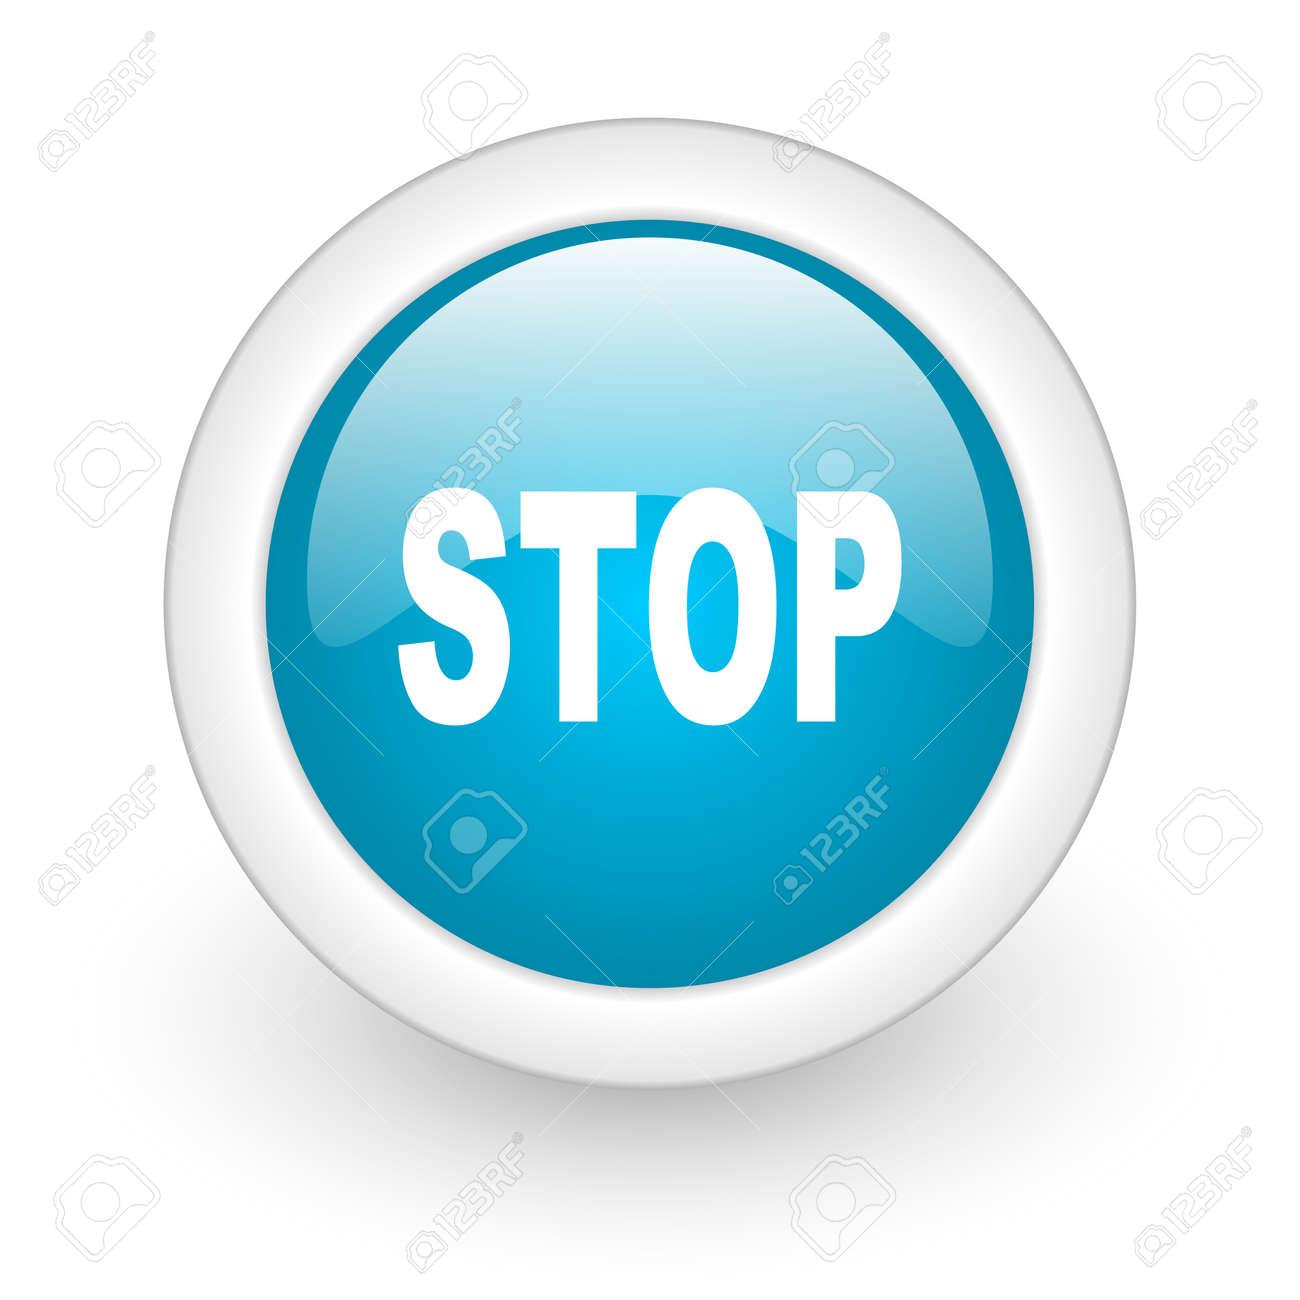 stop blue circle glossy web icon on white background Stock Photo - 17770408